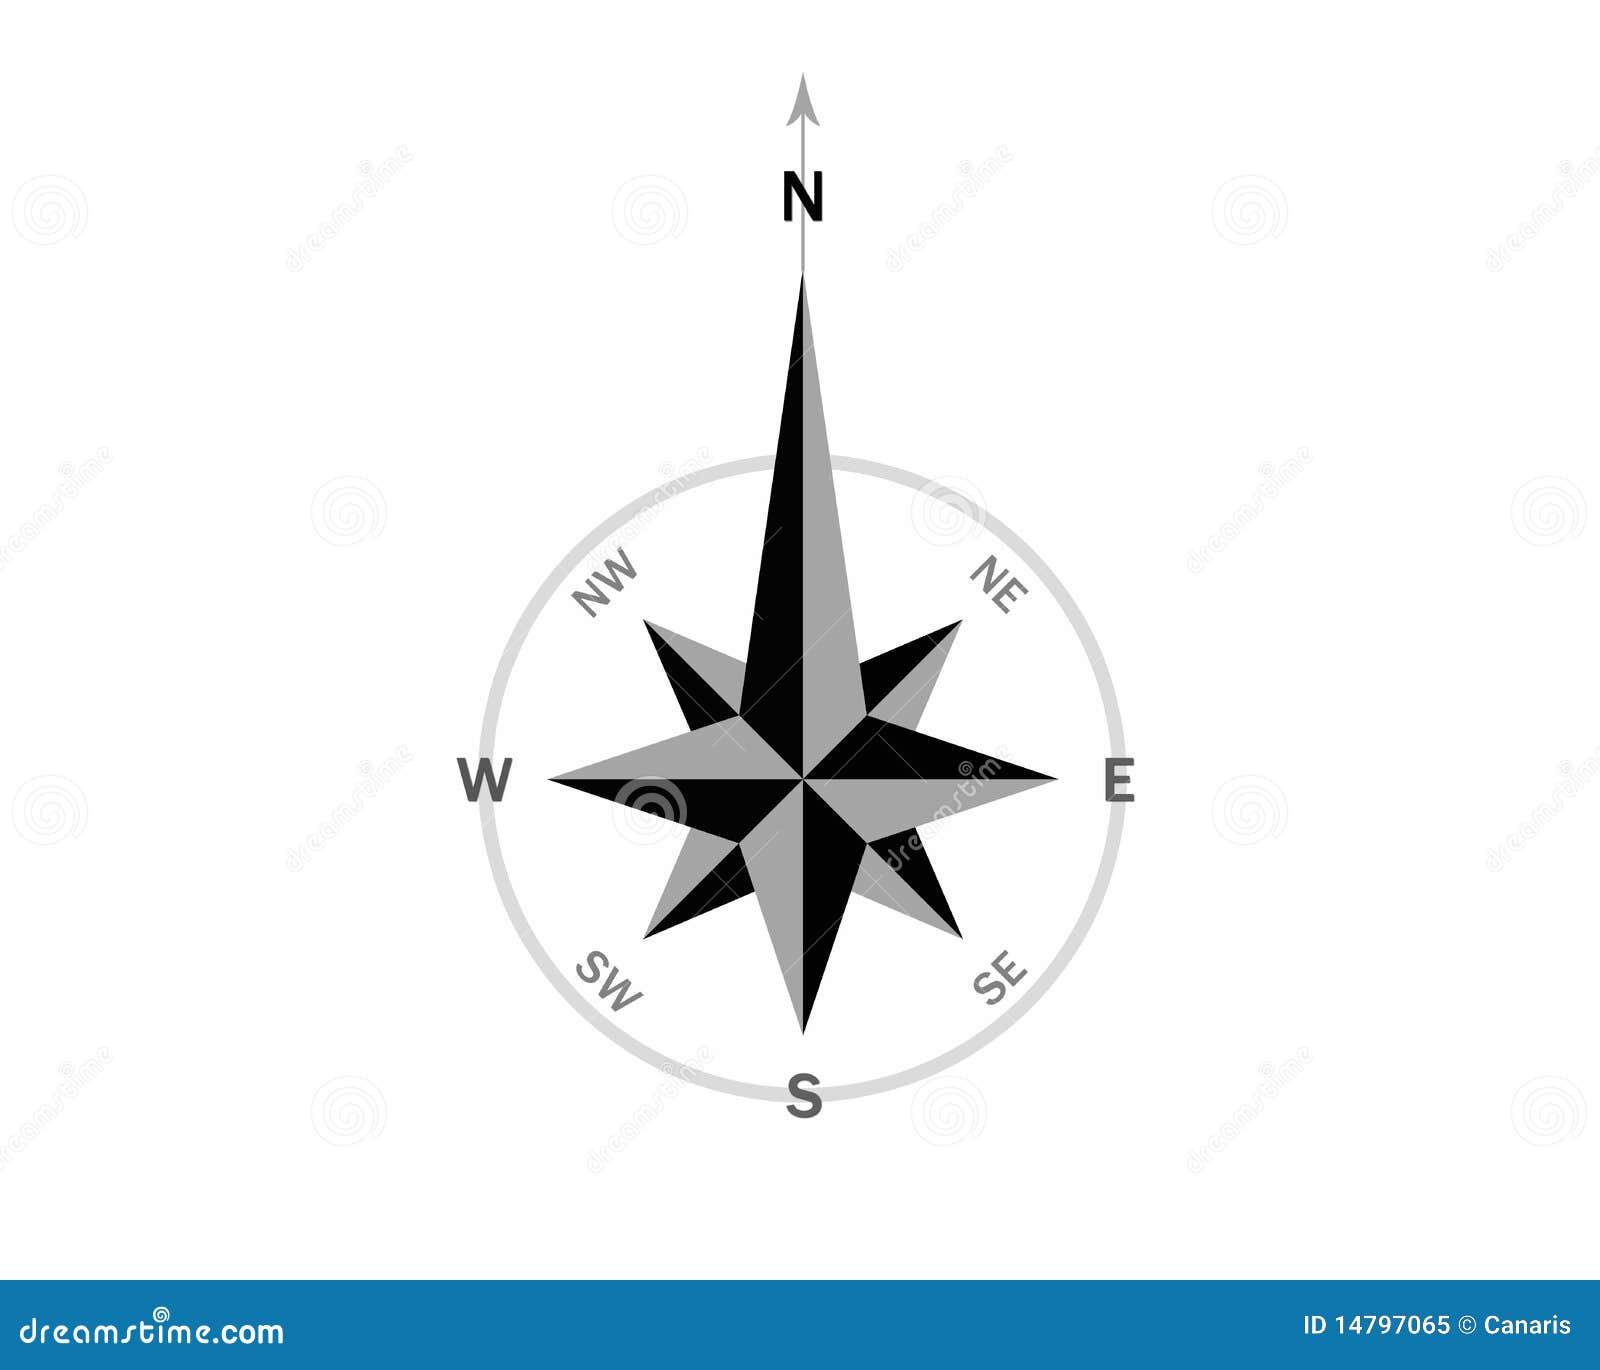 North Arrow Architecture Vector